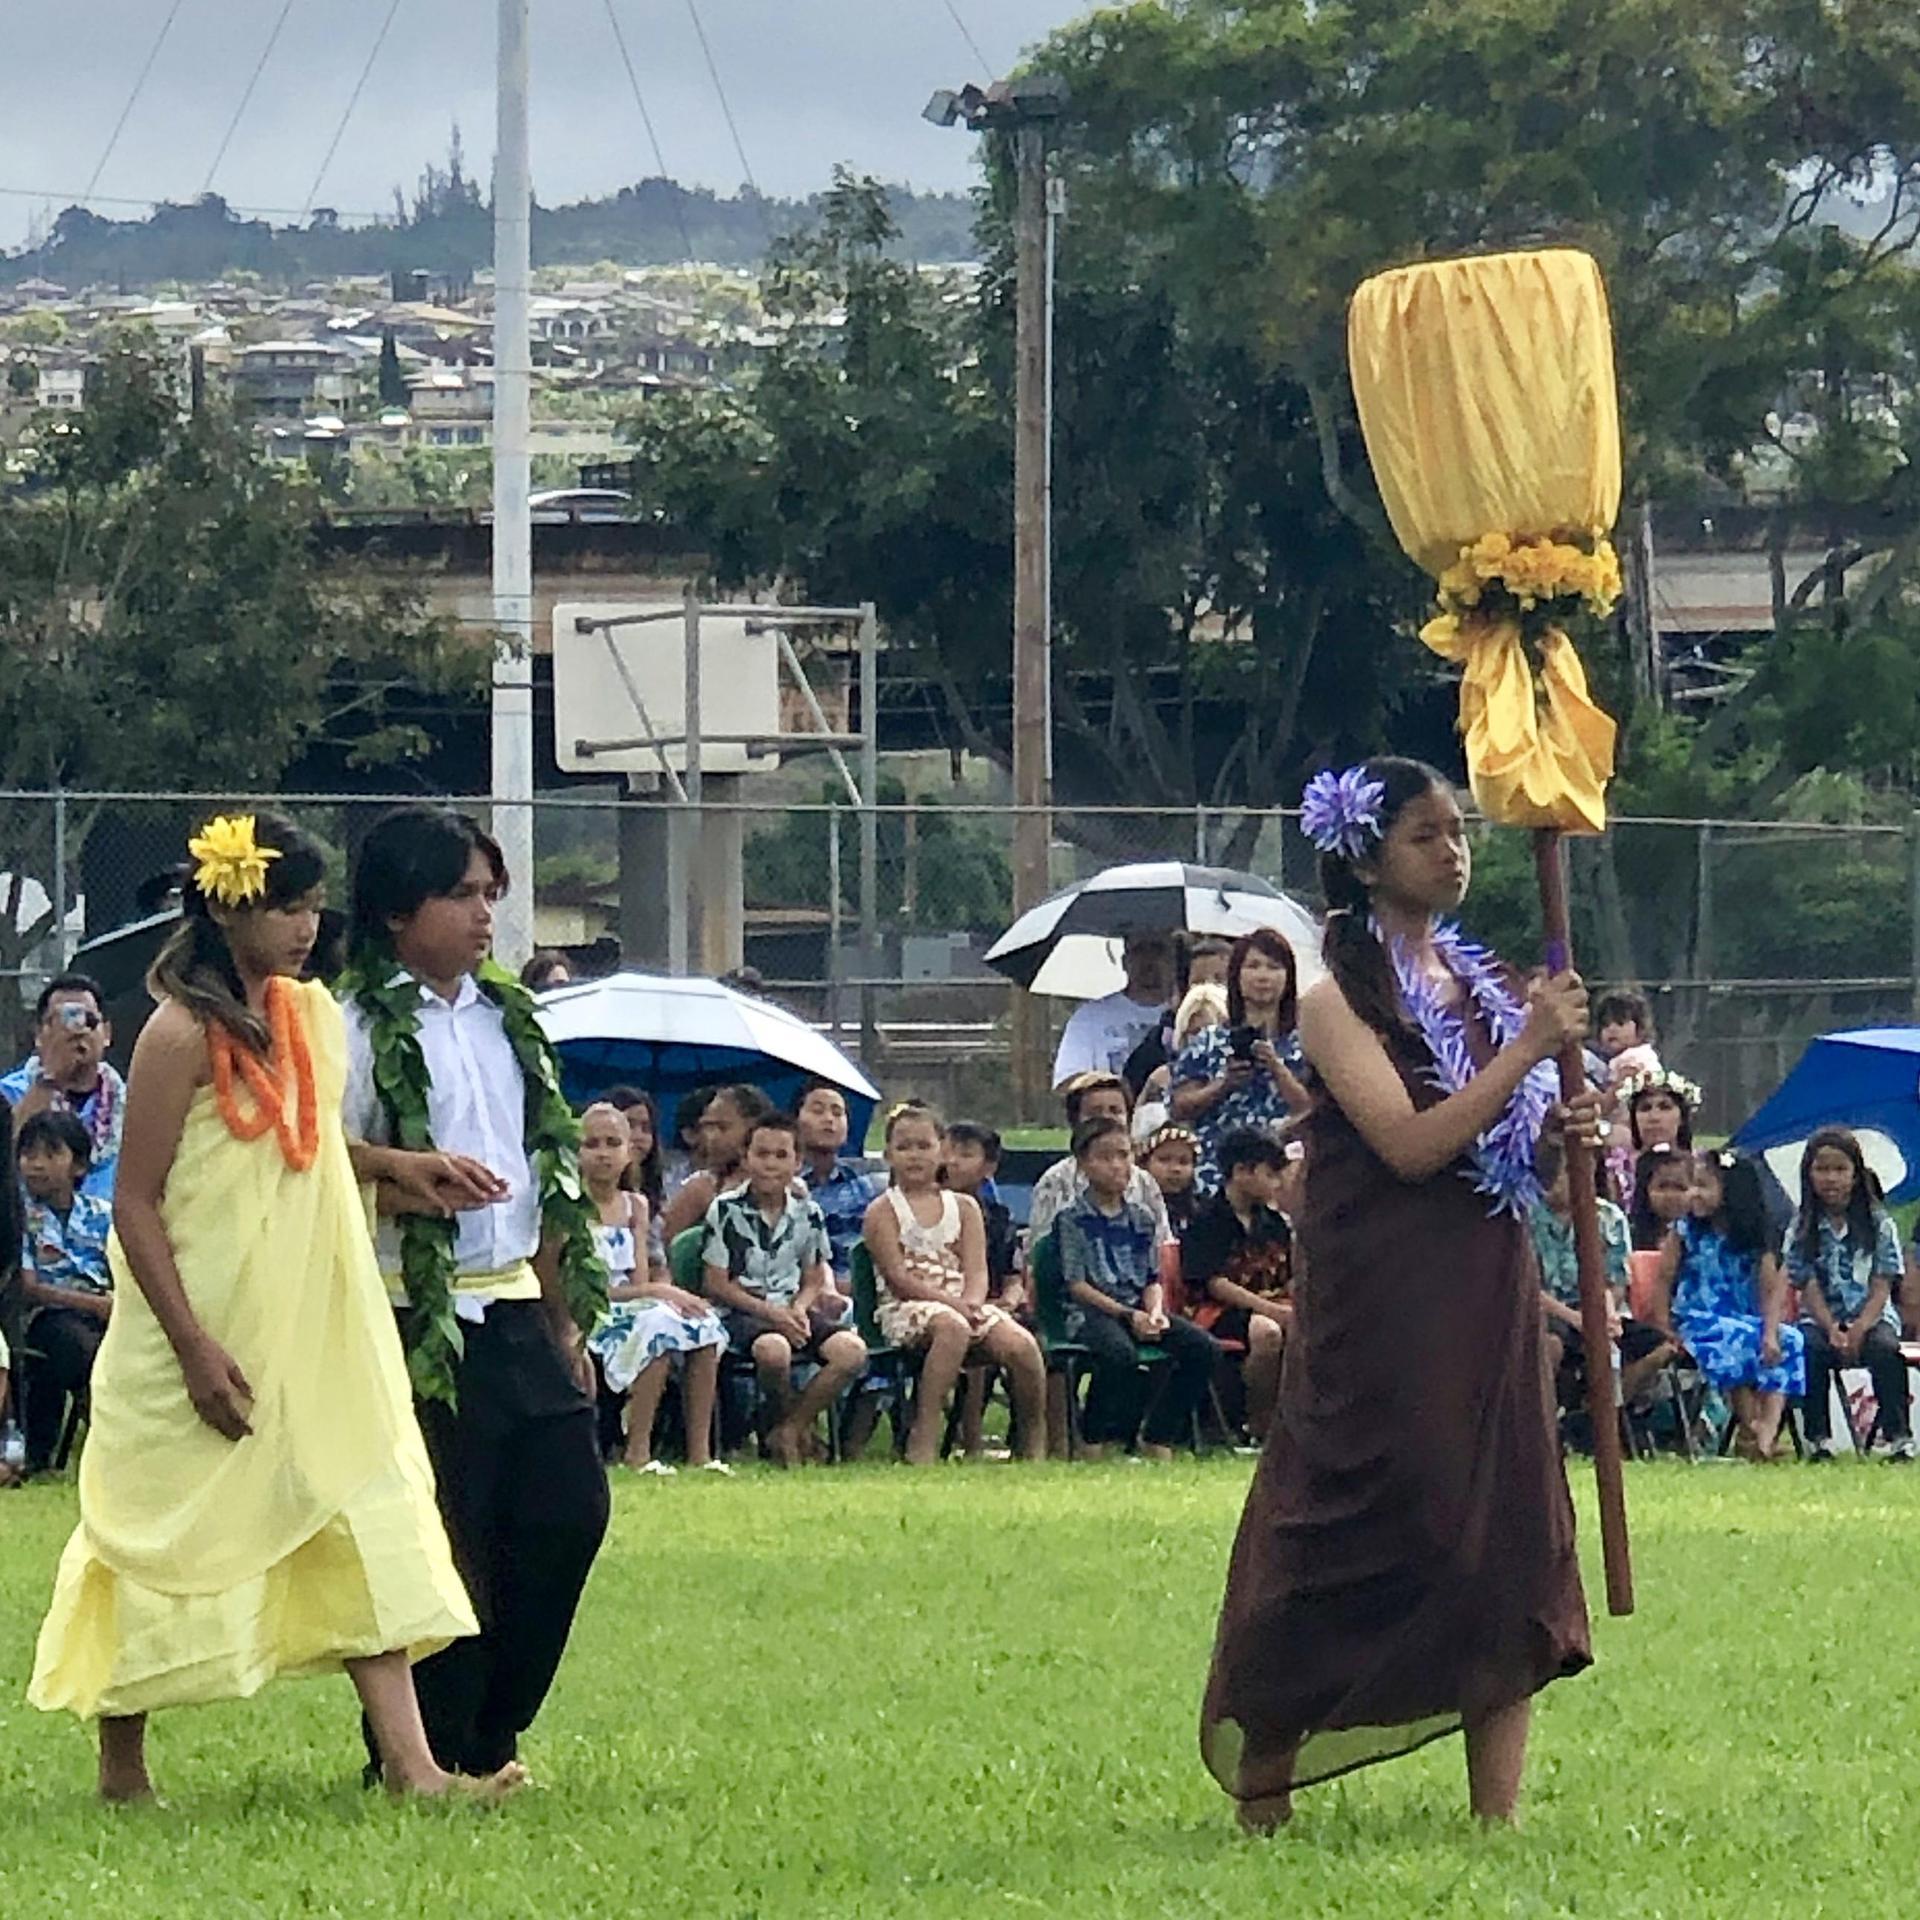 Oahu island princess and escort